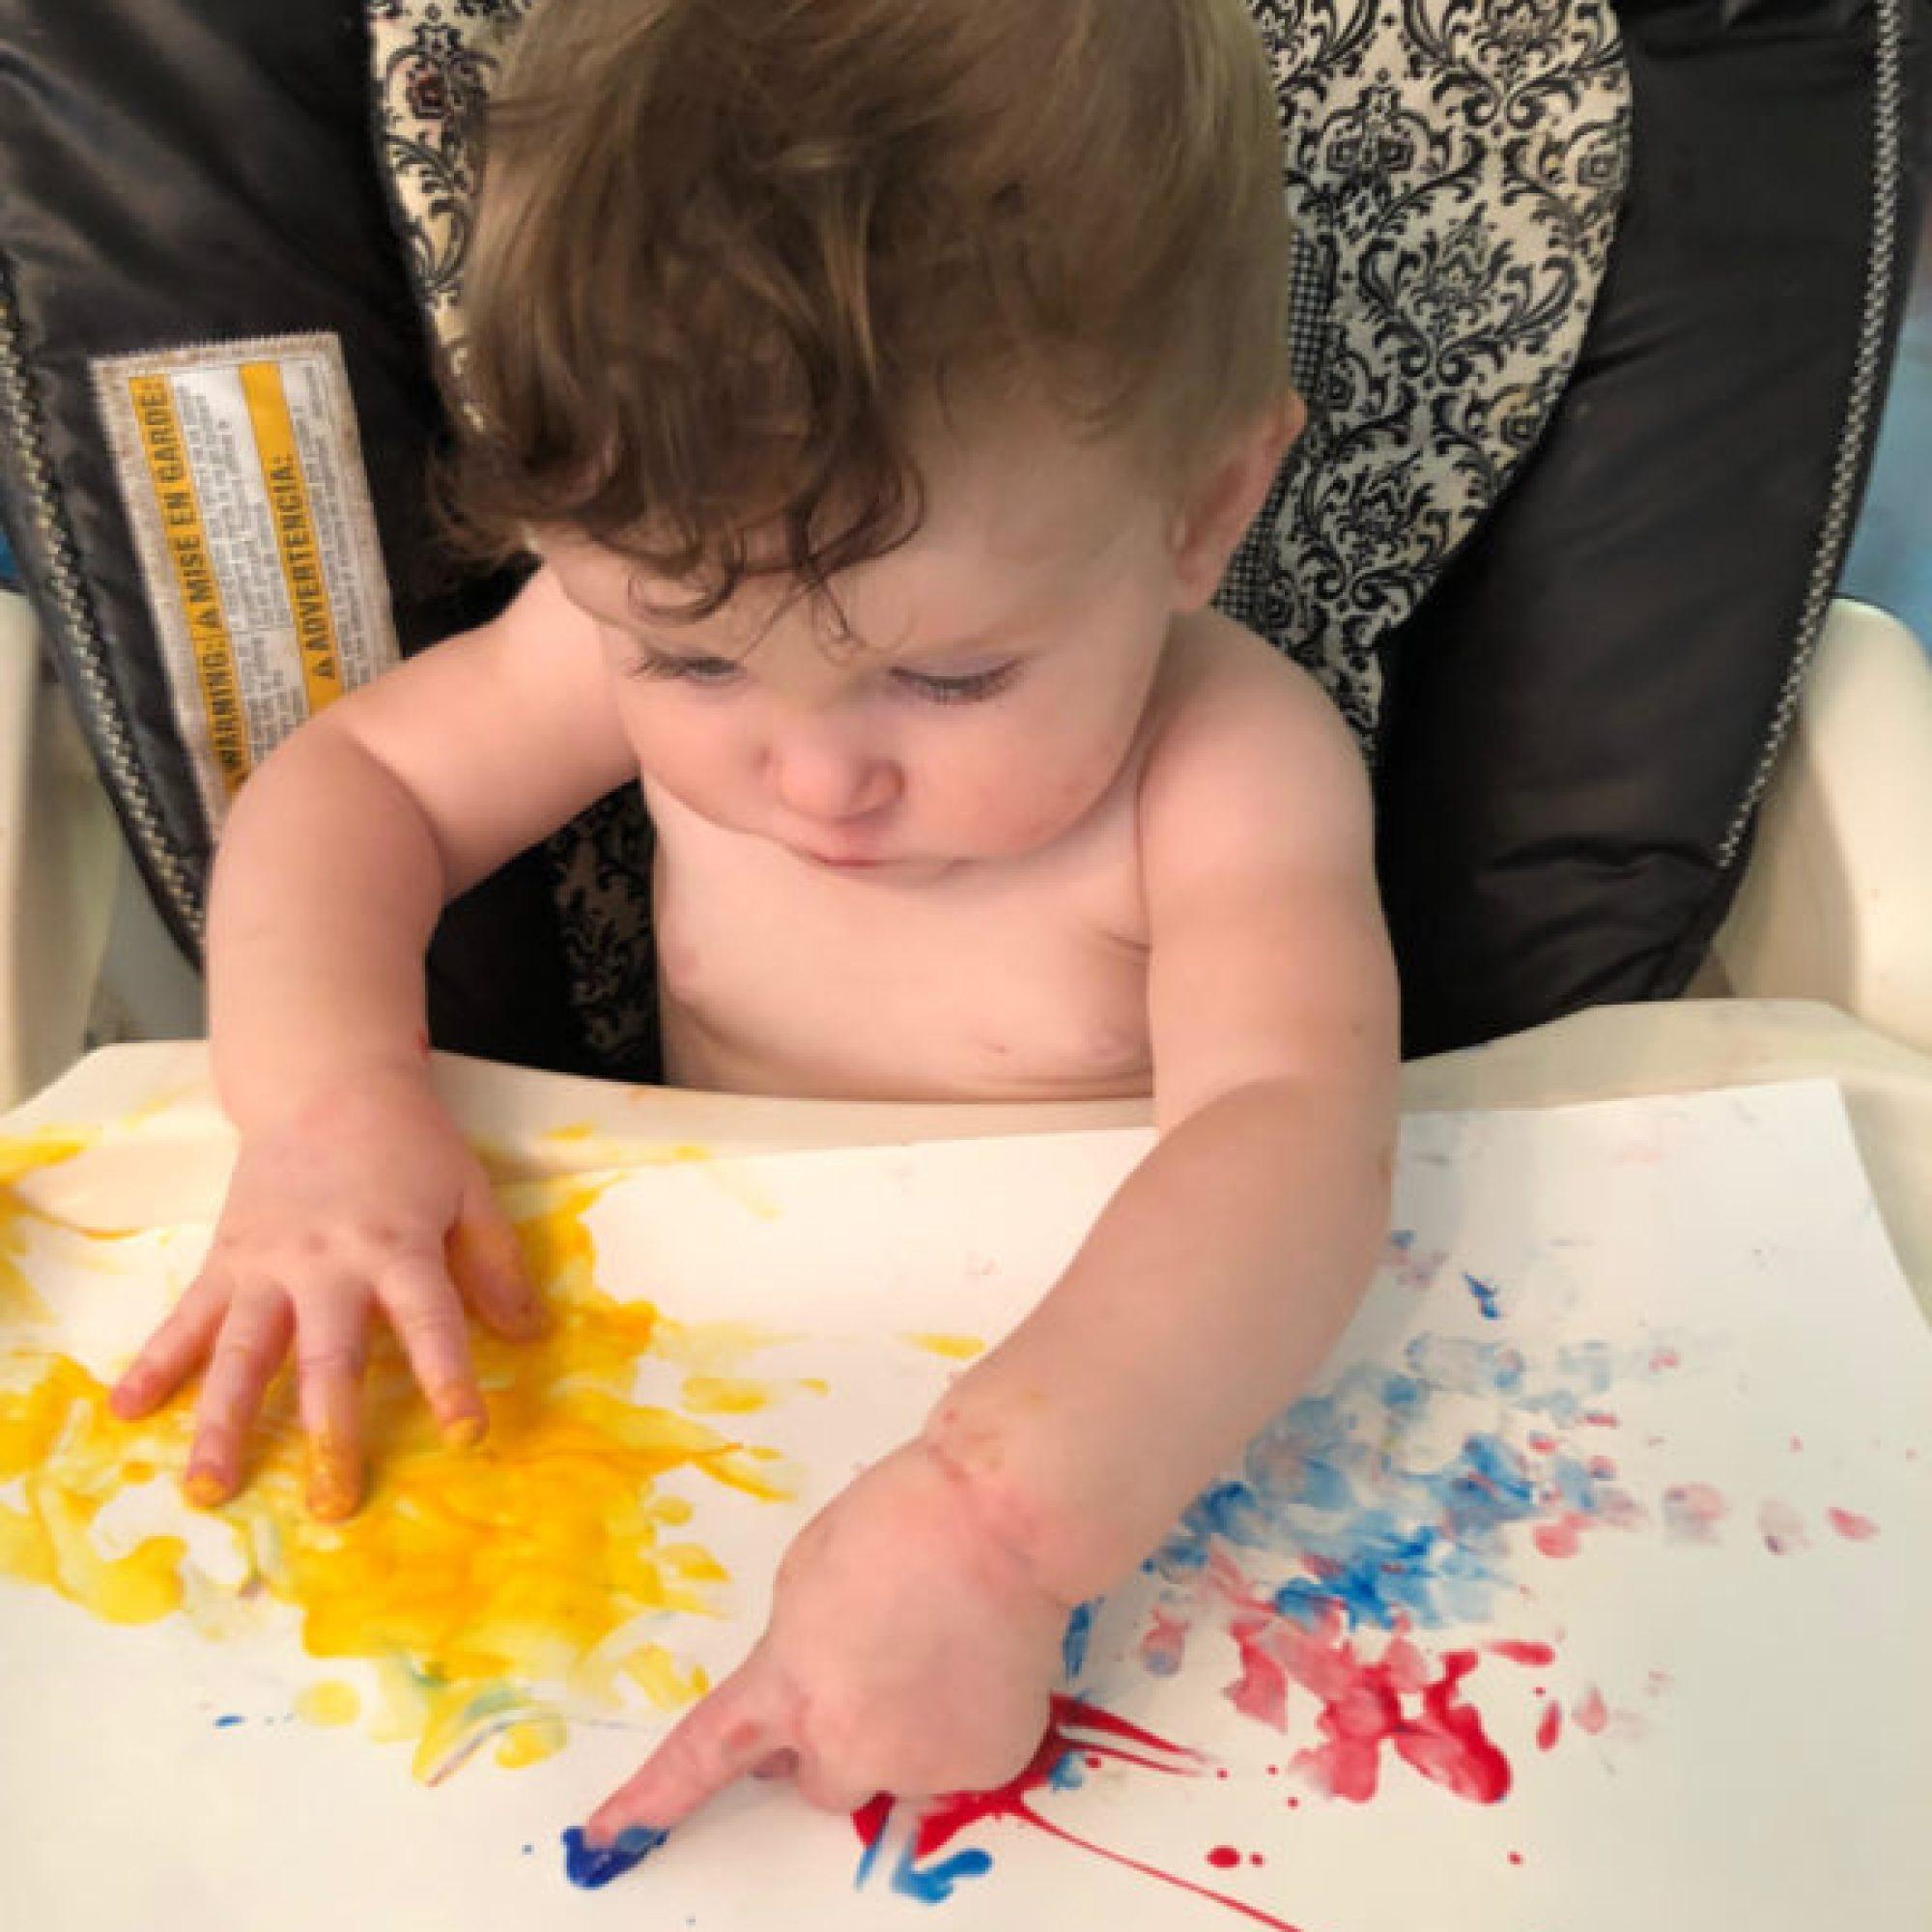 baby fingerpainting to improve fine motor skills